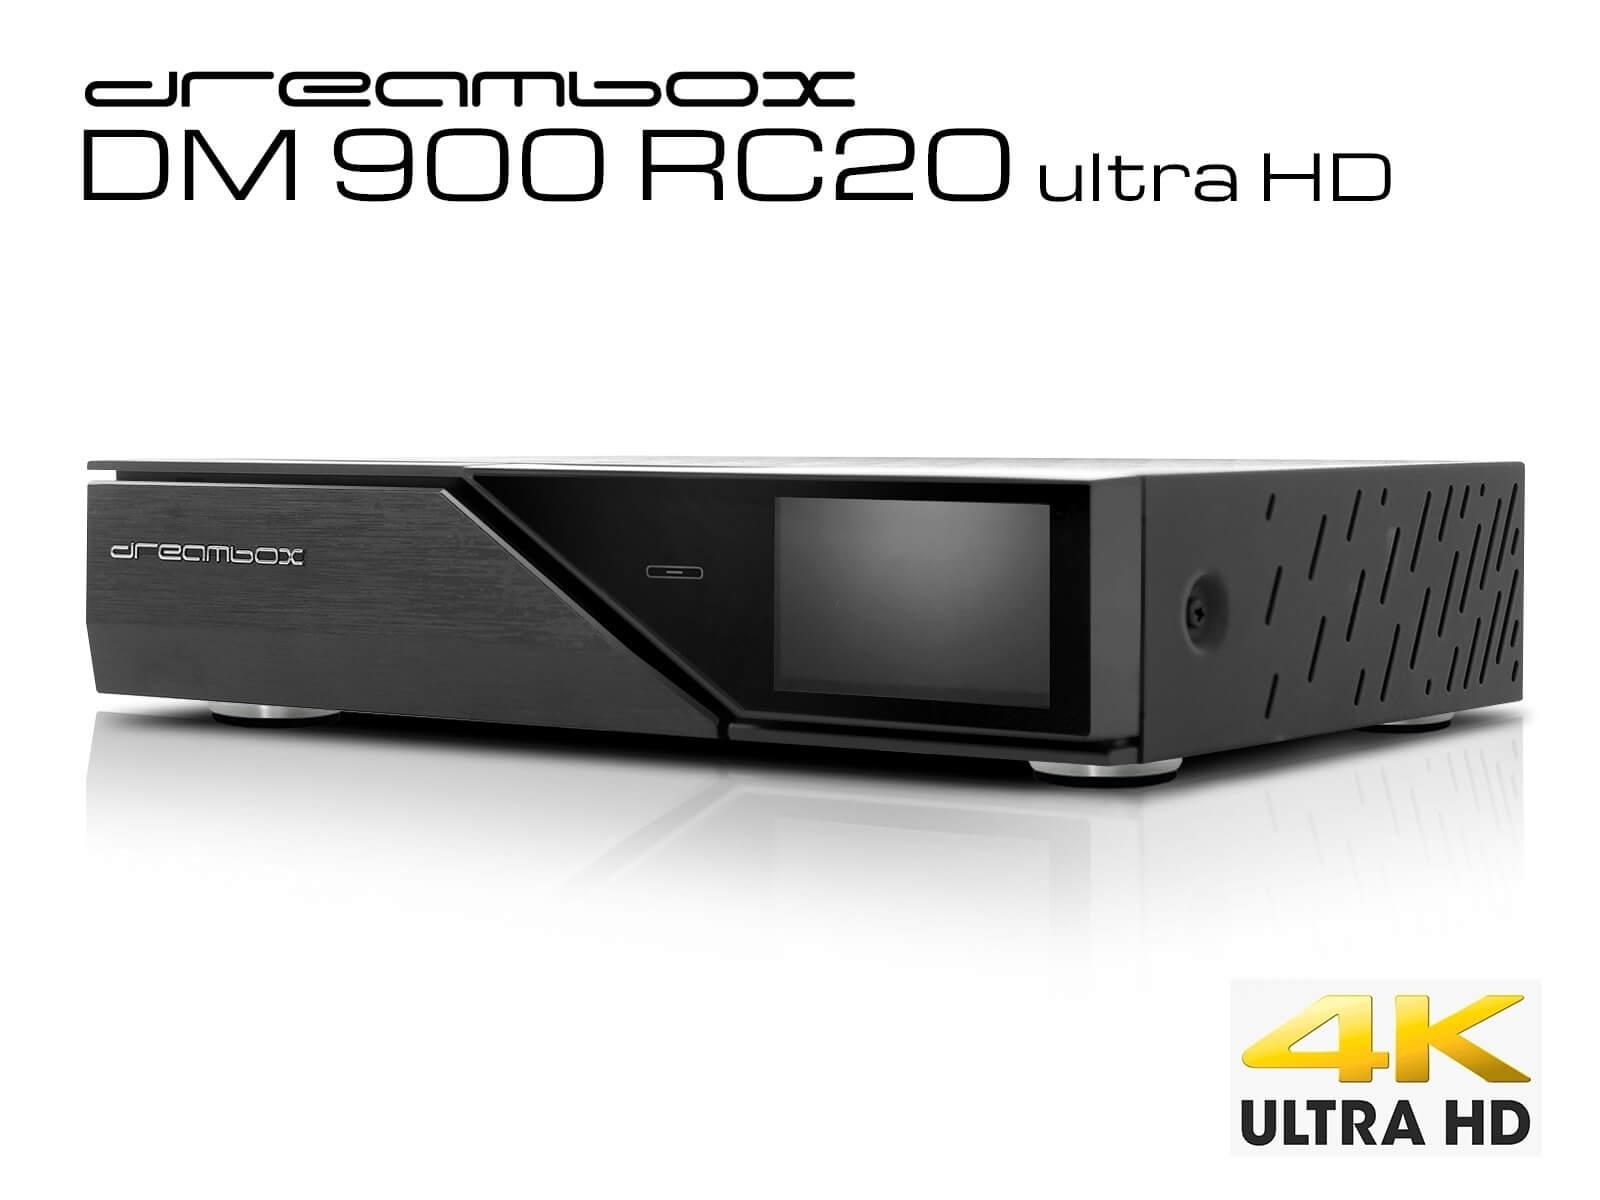 TV box: Dreambox DM900 RC20 4K UHD - new version with 8 GB flashram